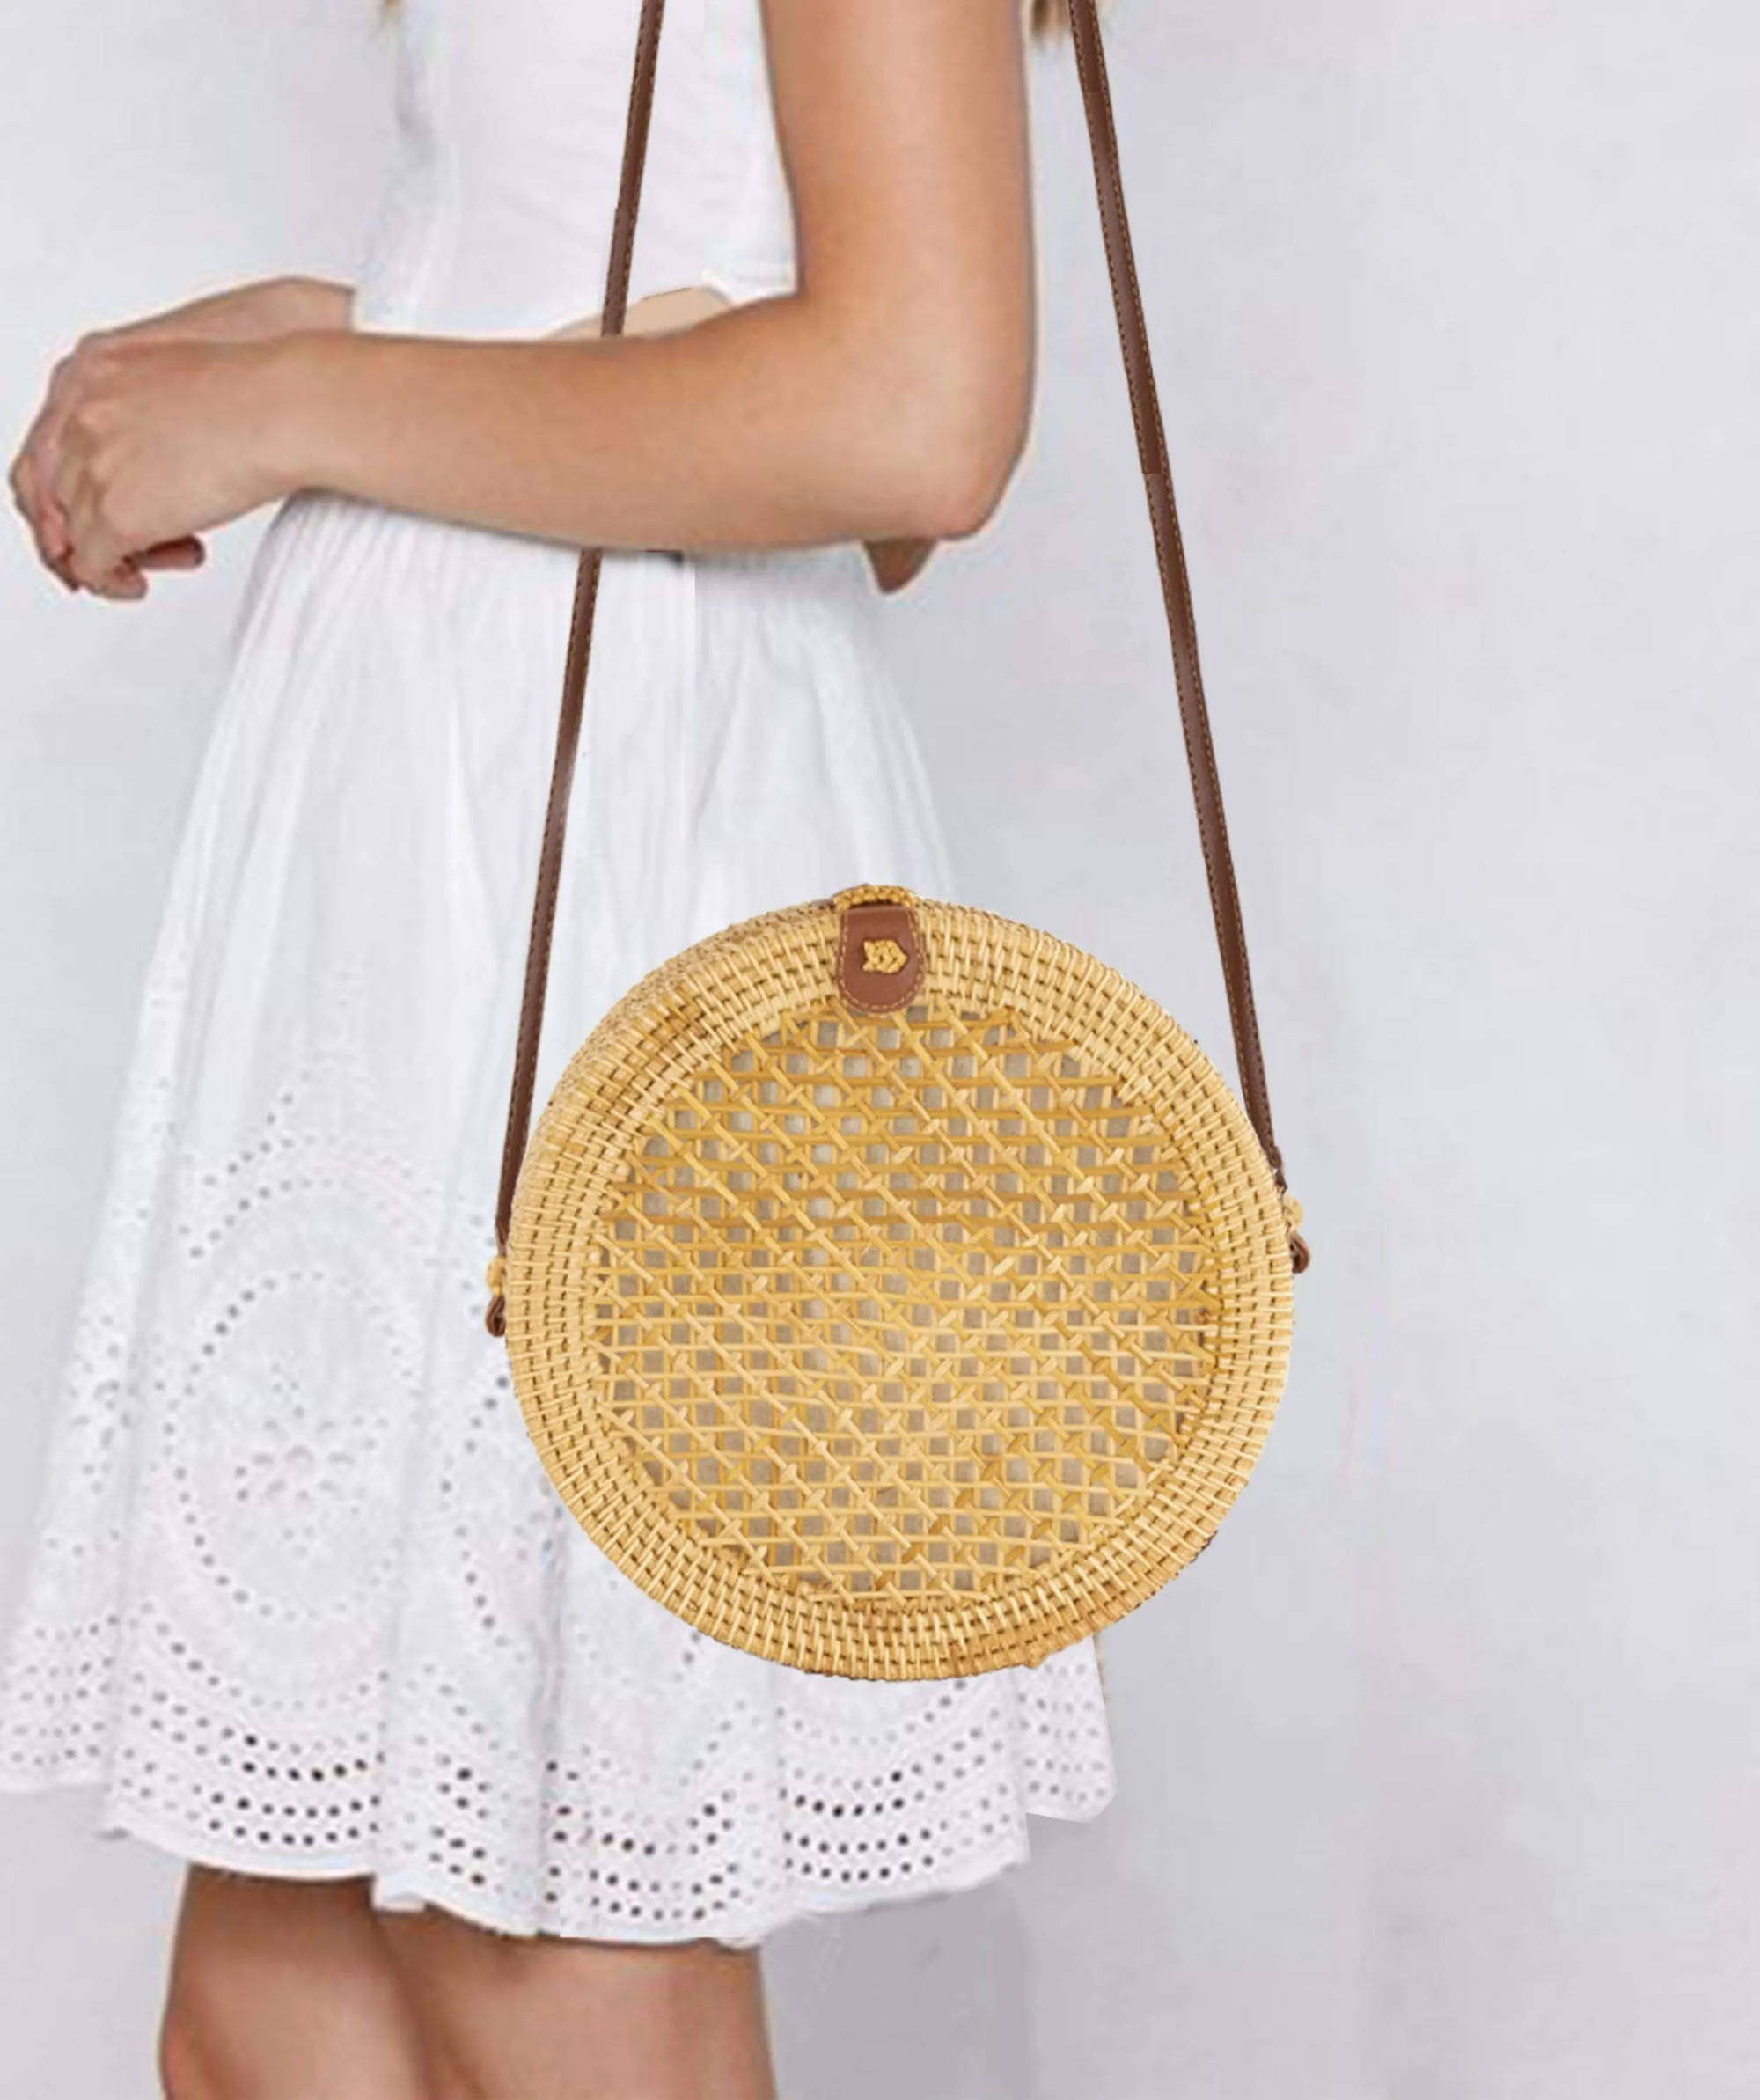 large-beehive-rattan-bag-natural-color-for-girl